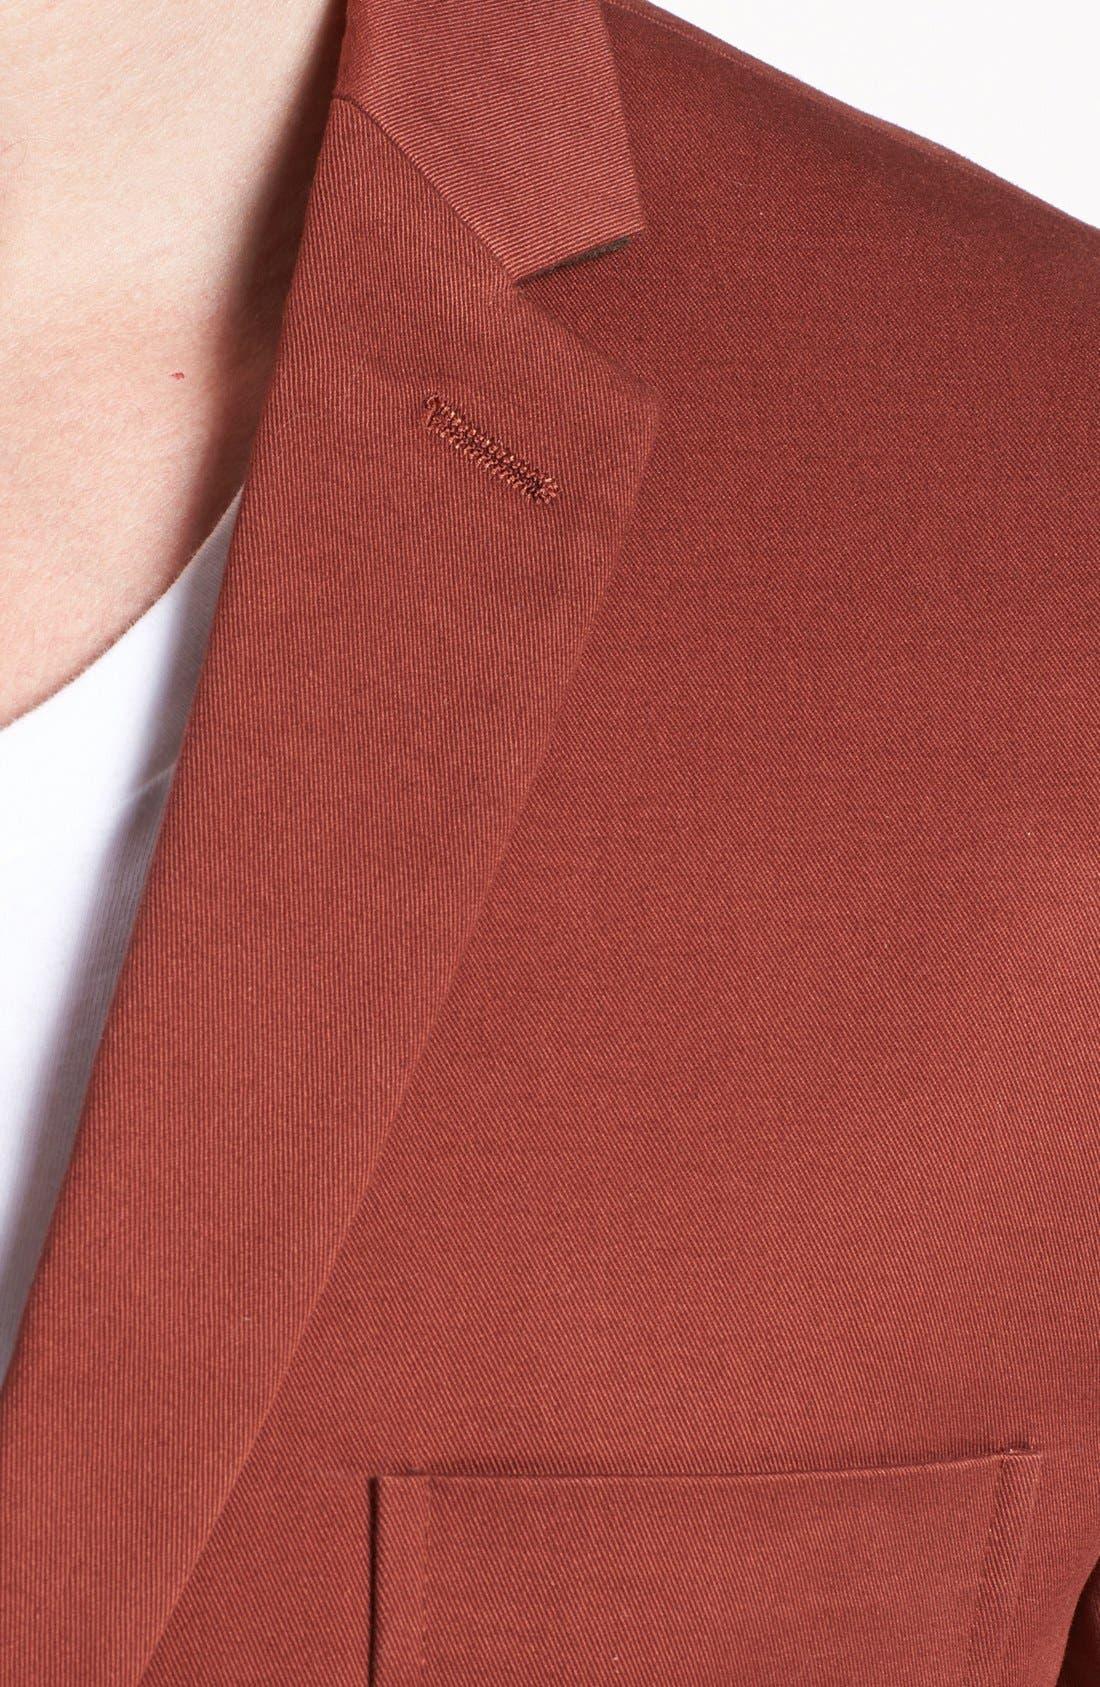 Alternate Image 3  - Dockers® Cotton Twill Sportcoat